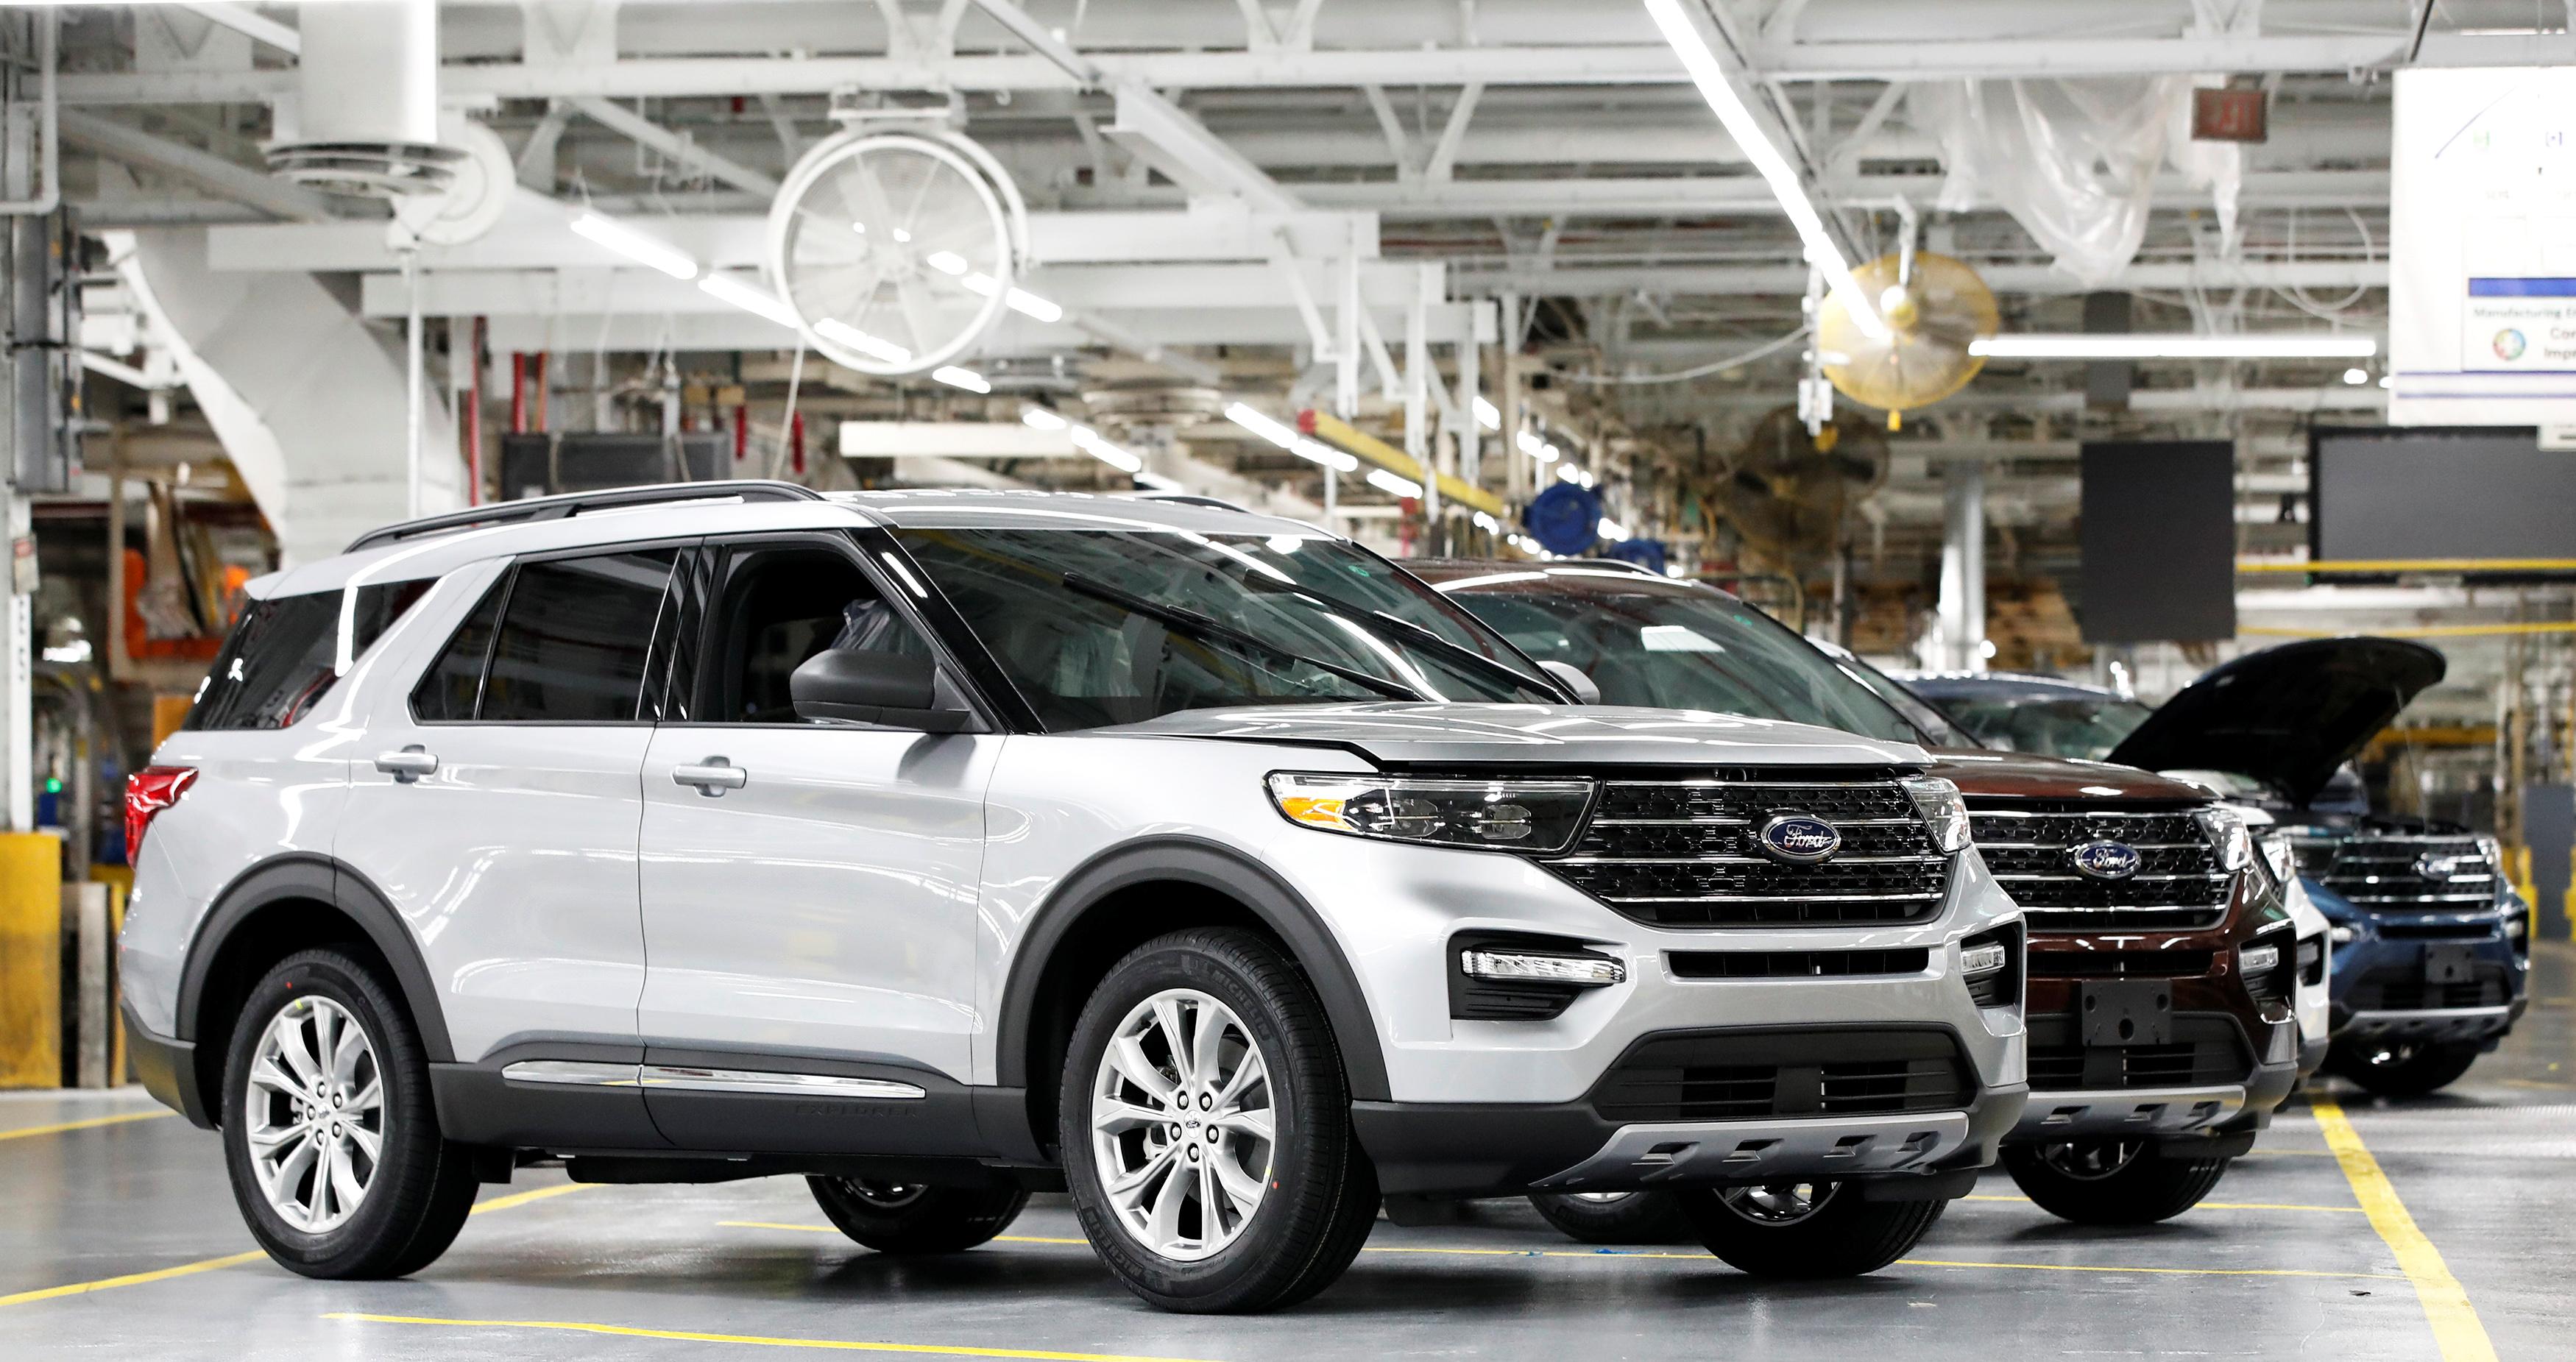 Junking Ford threatens shares more than bonds – Breakingviews